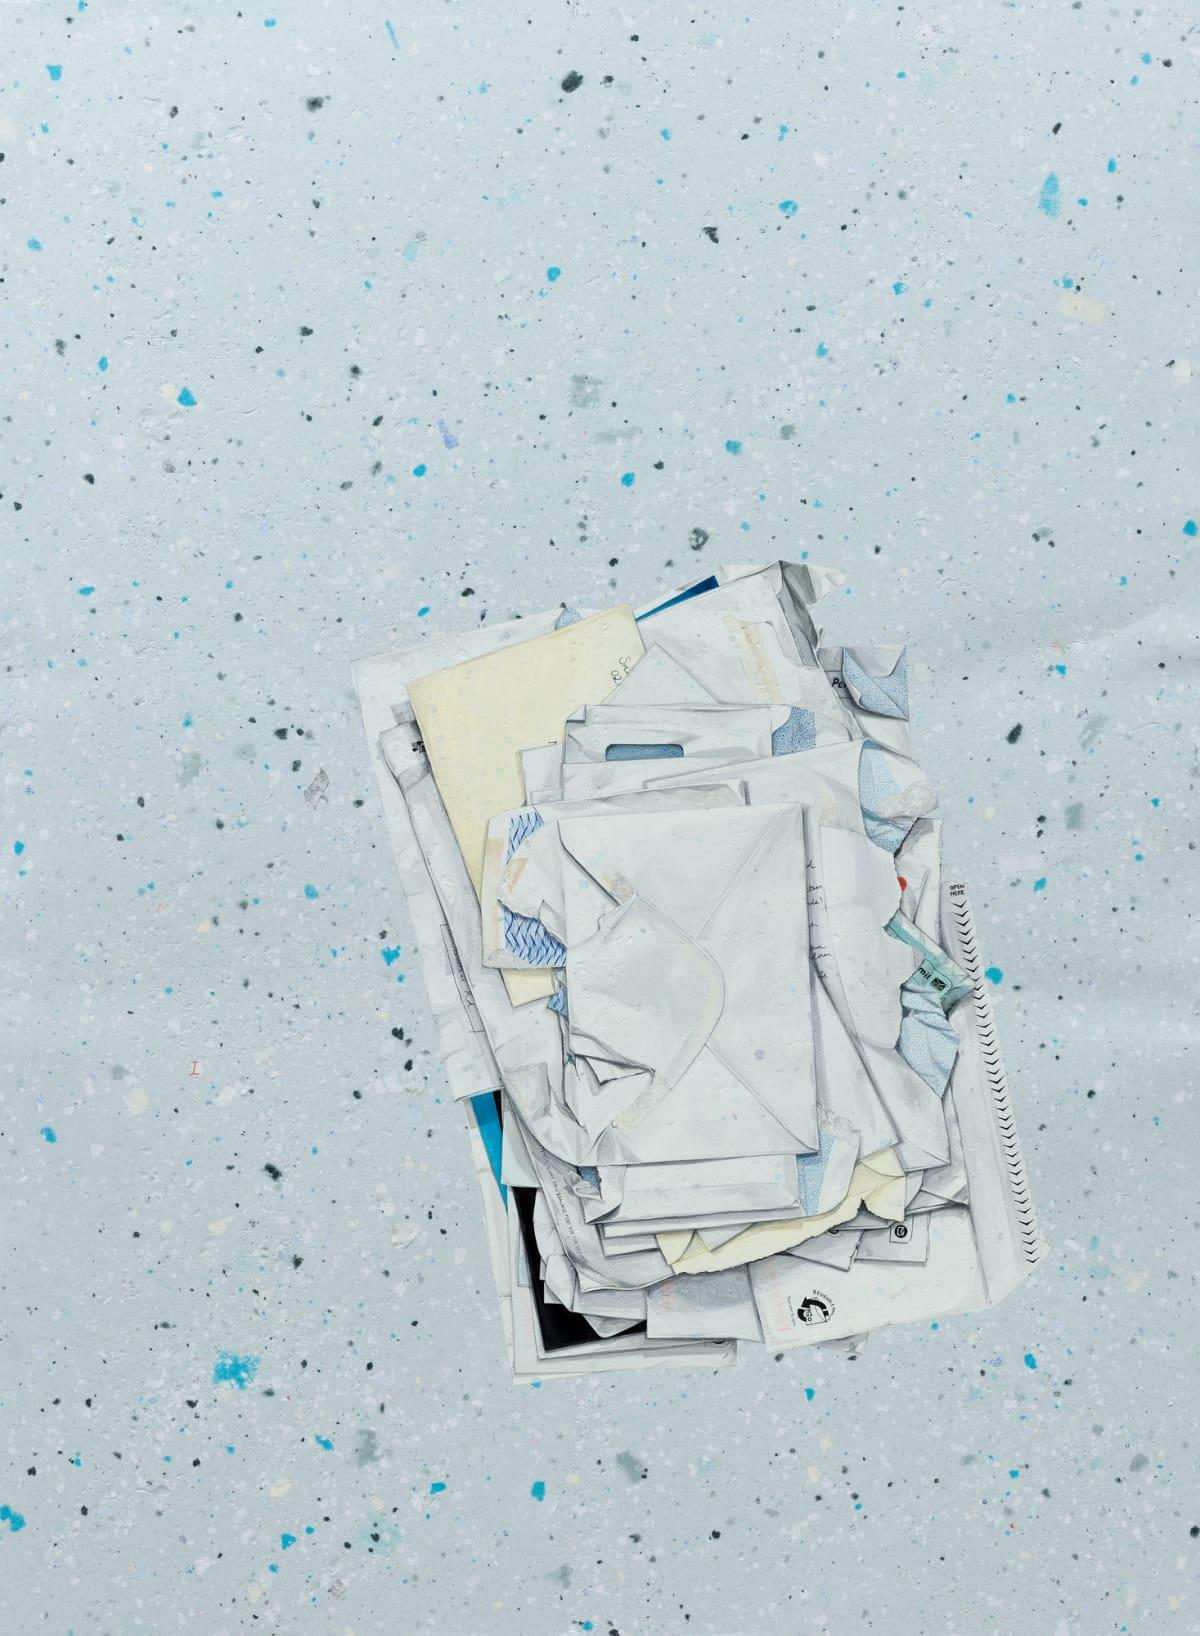 Marita Hewitt, Of Itself (More Envelopes), 2017